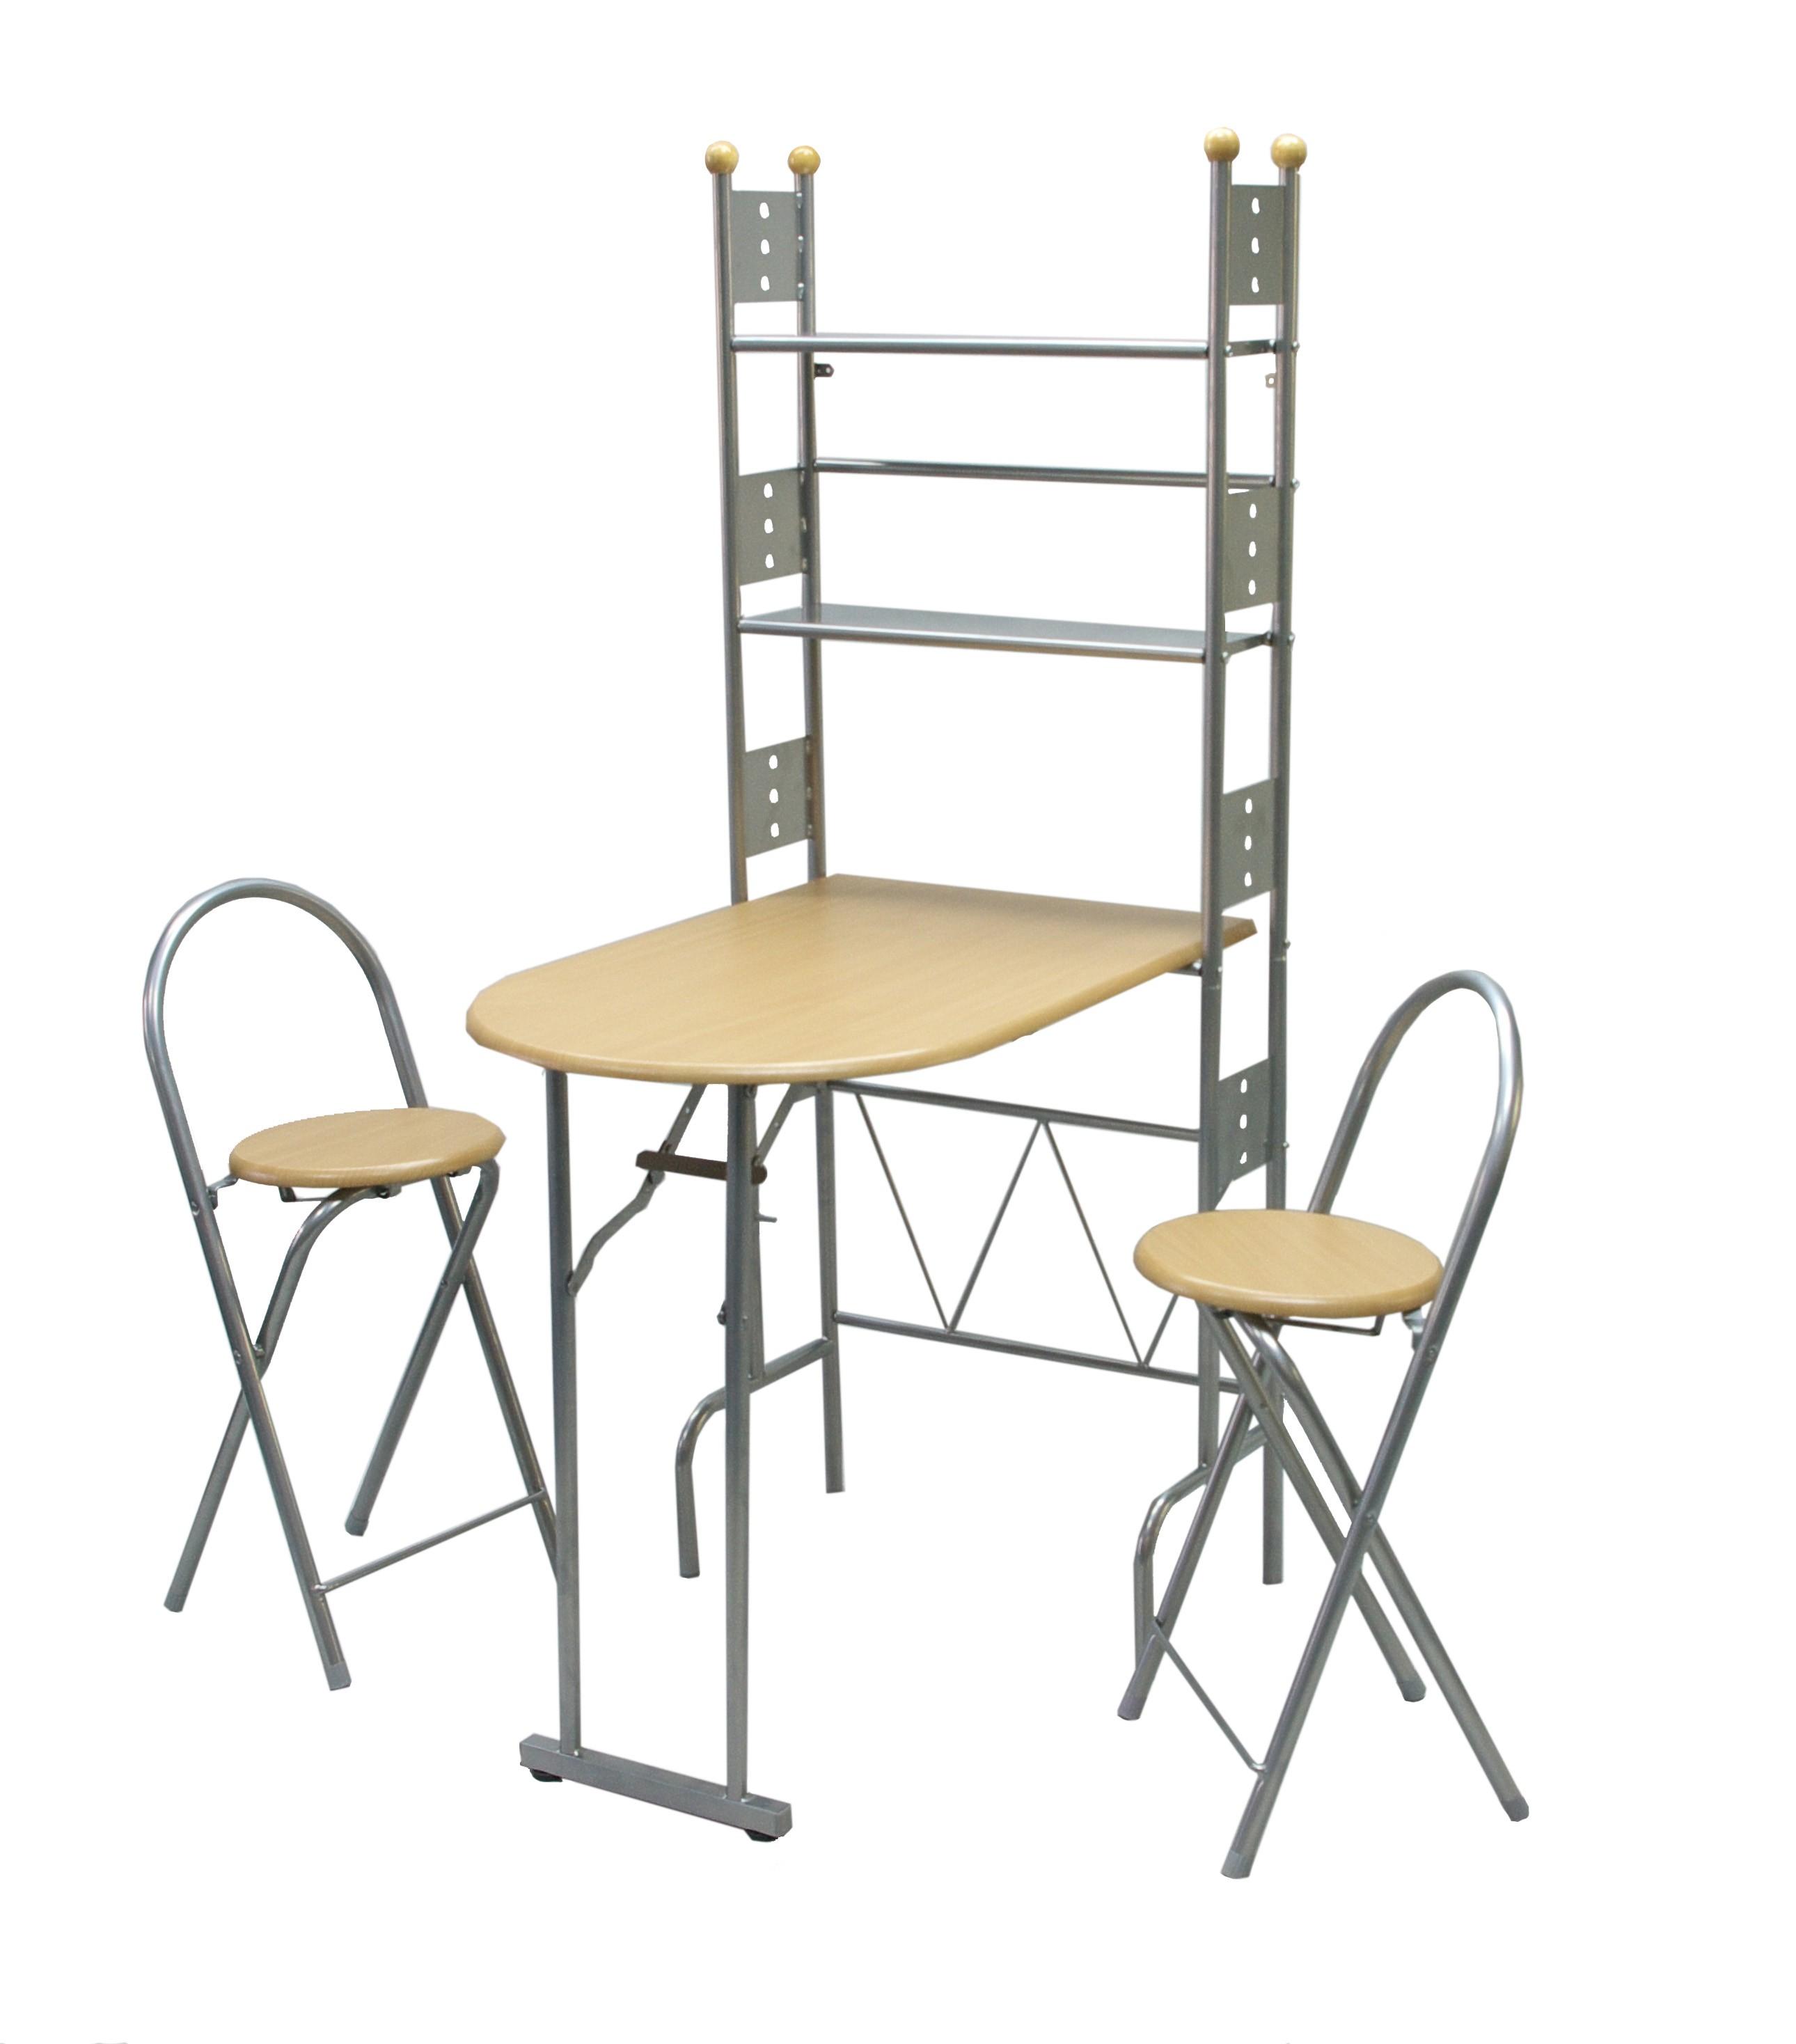 Dedeman set masa plianta de perete cu 2 scaune ds25054 fag for Masa cu scaune dedeman